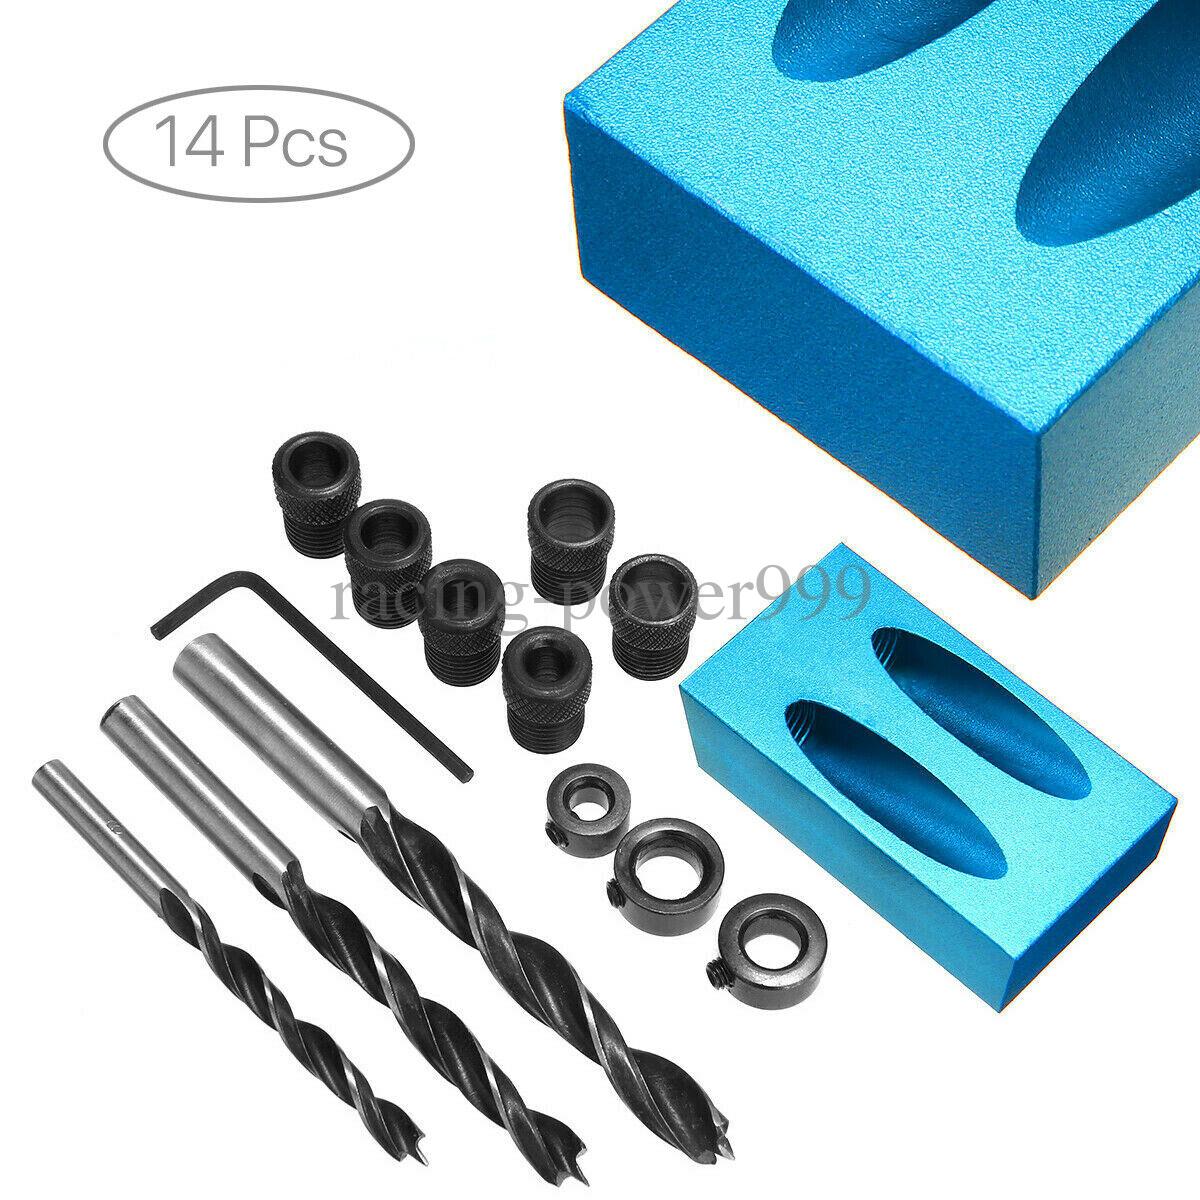 14 Pcs Inclined Hole Drill Bit Set System Screw Wood Pockethole Jig Mini Tool